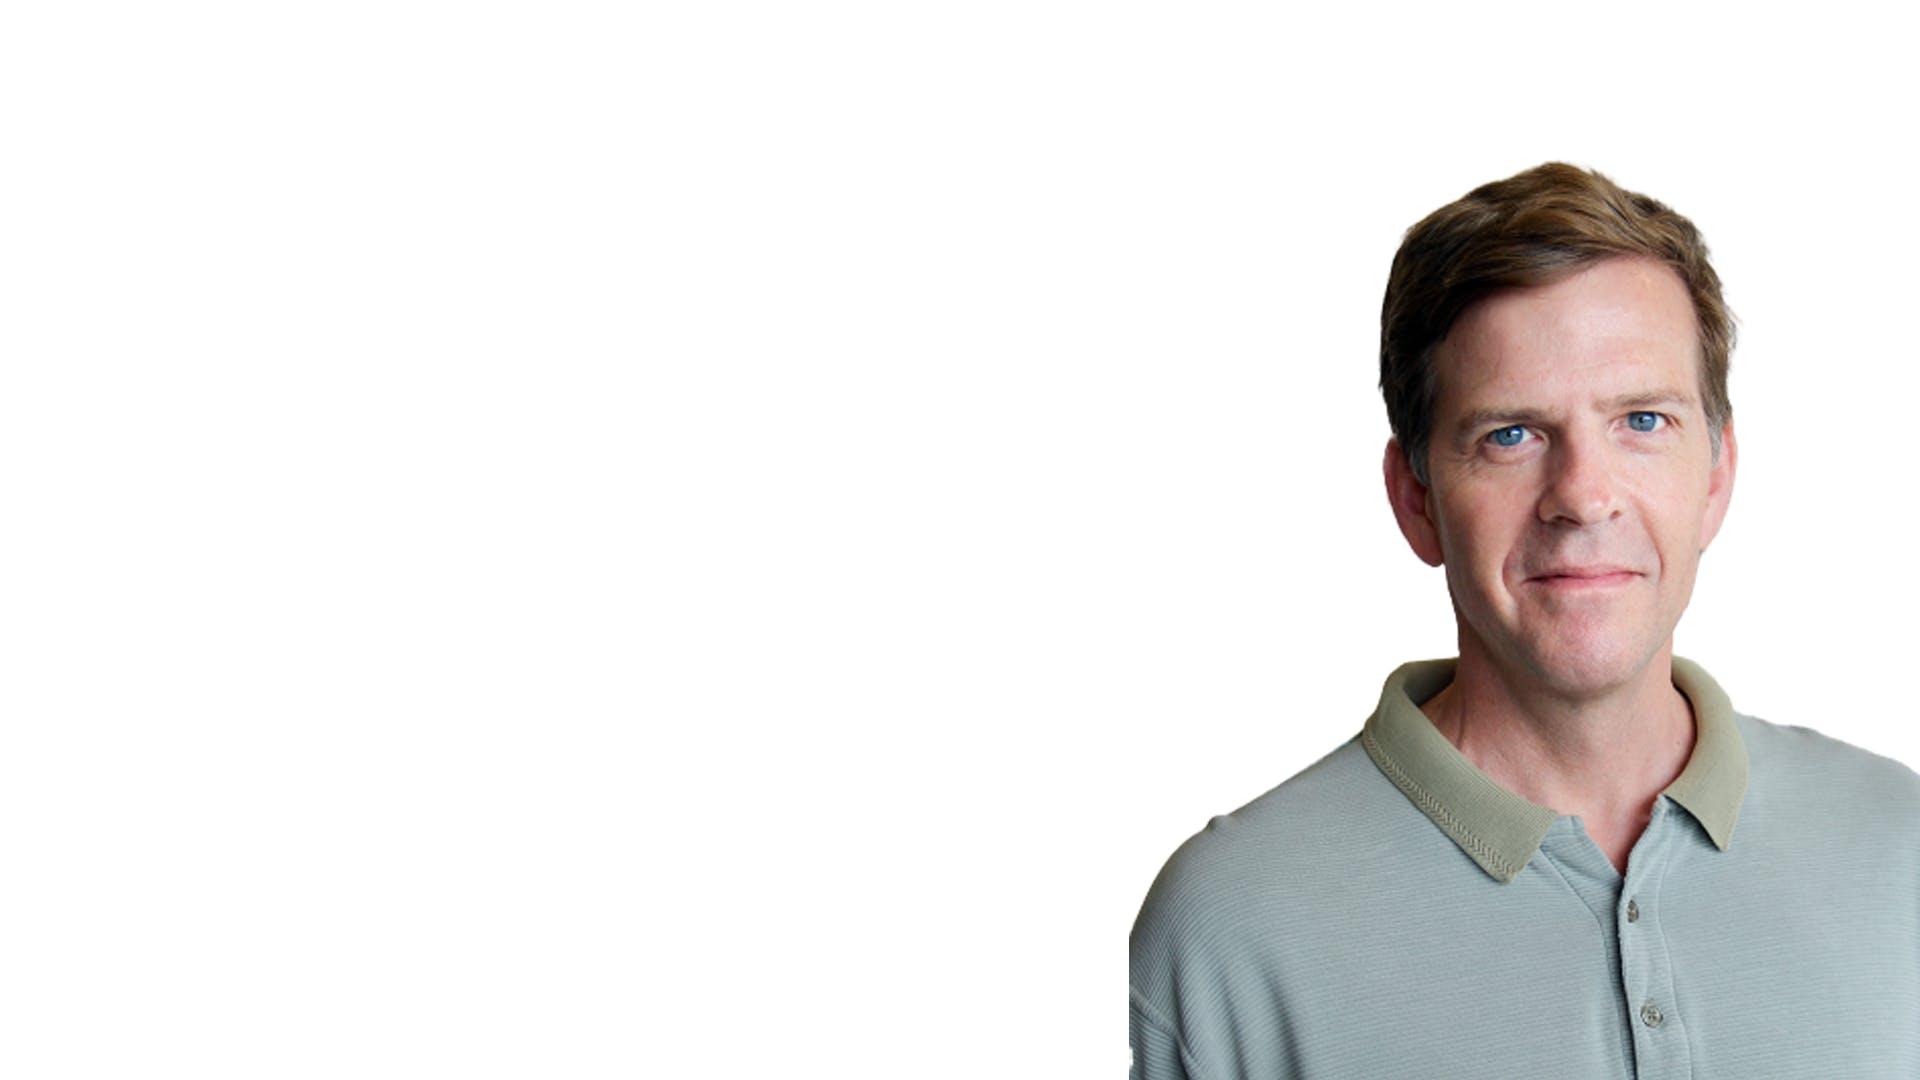 Q&A with Autodesk's Randy Swearer